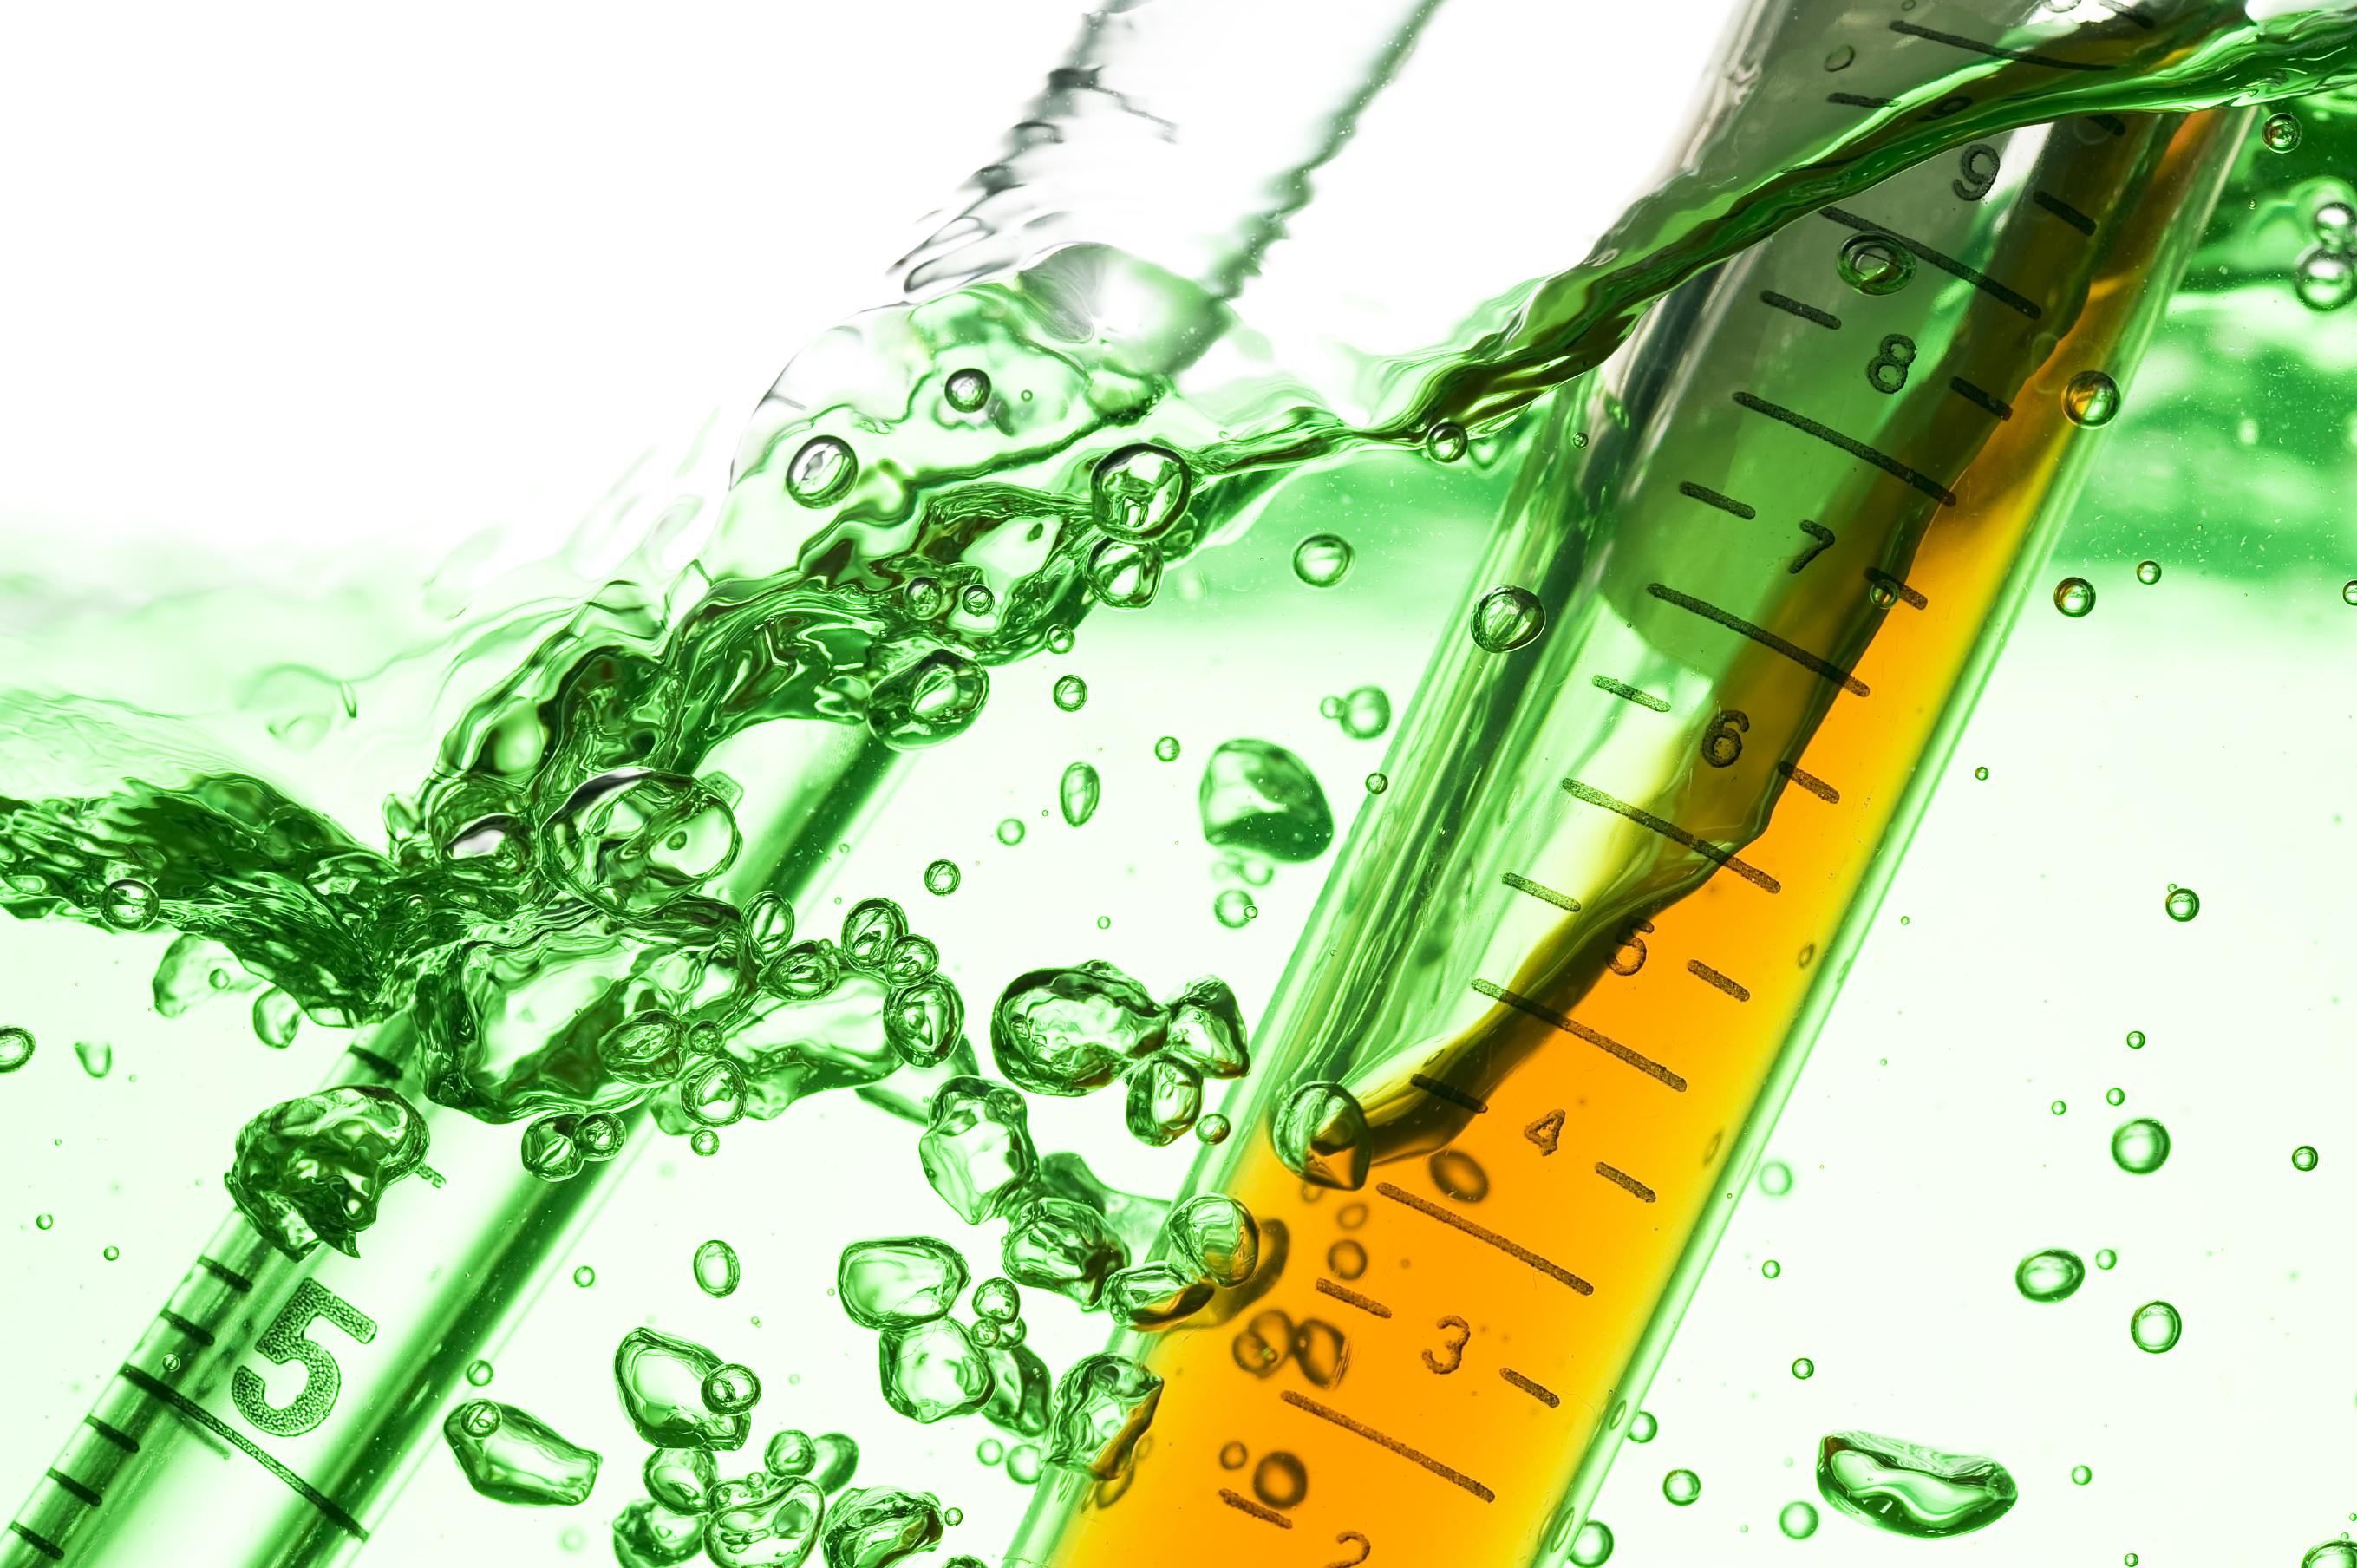 Chlorine Dioxide Testing Vile